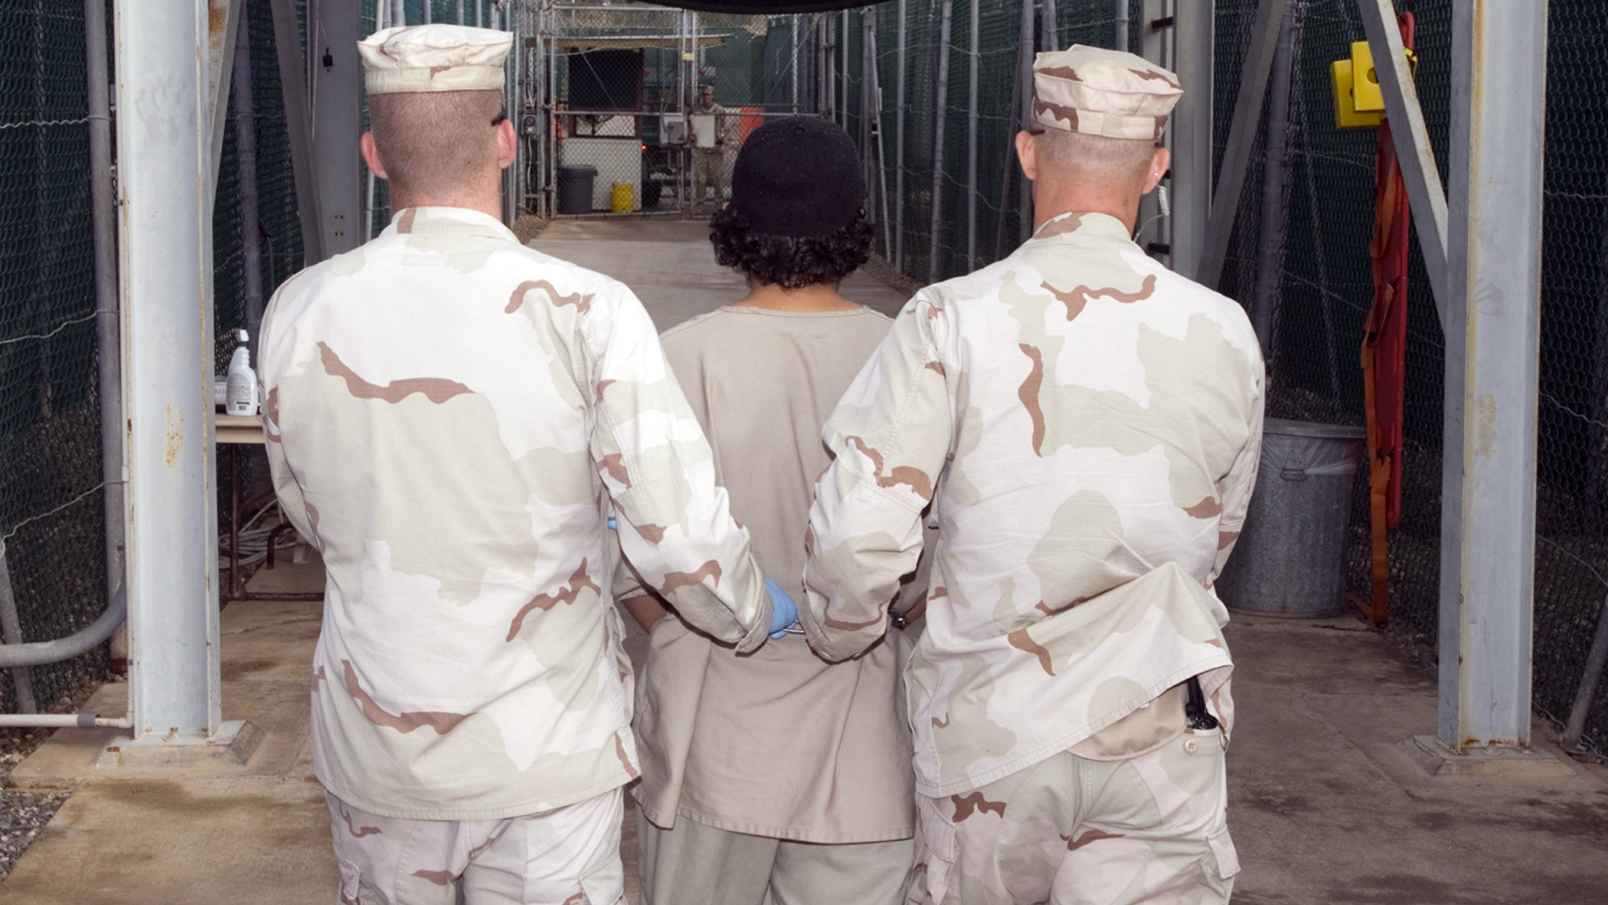 captive_being_escorted_for_medical_care_december_2007